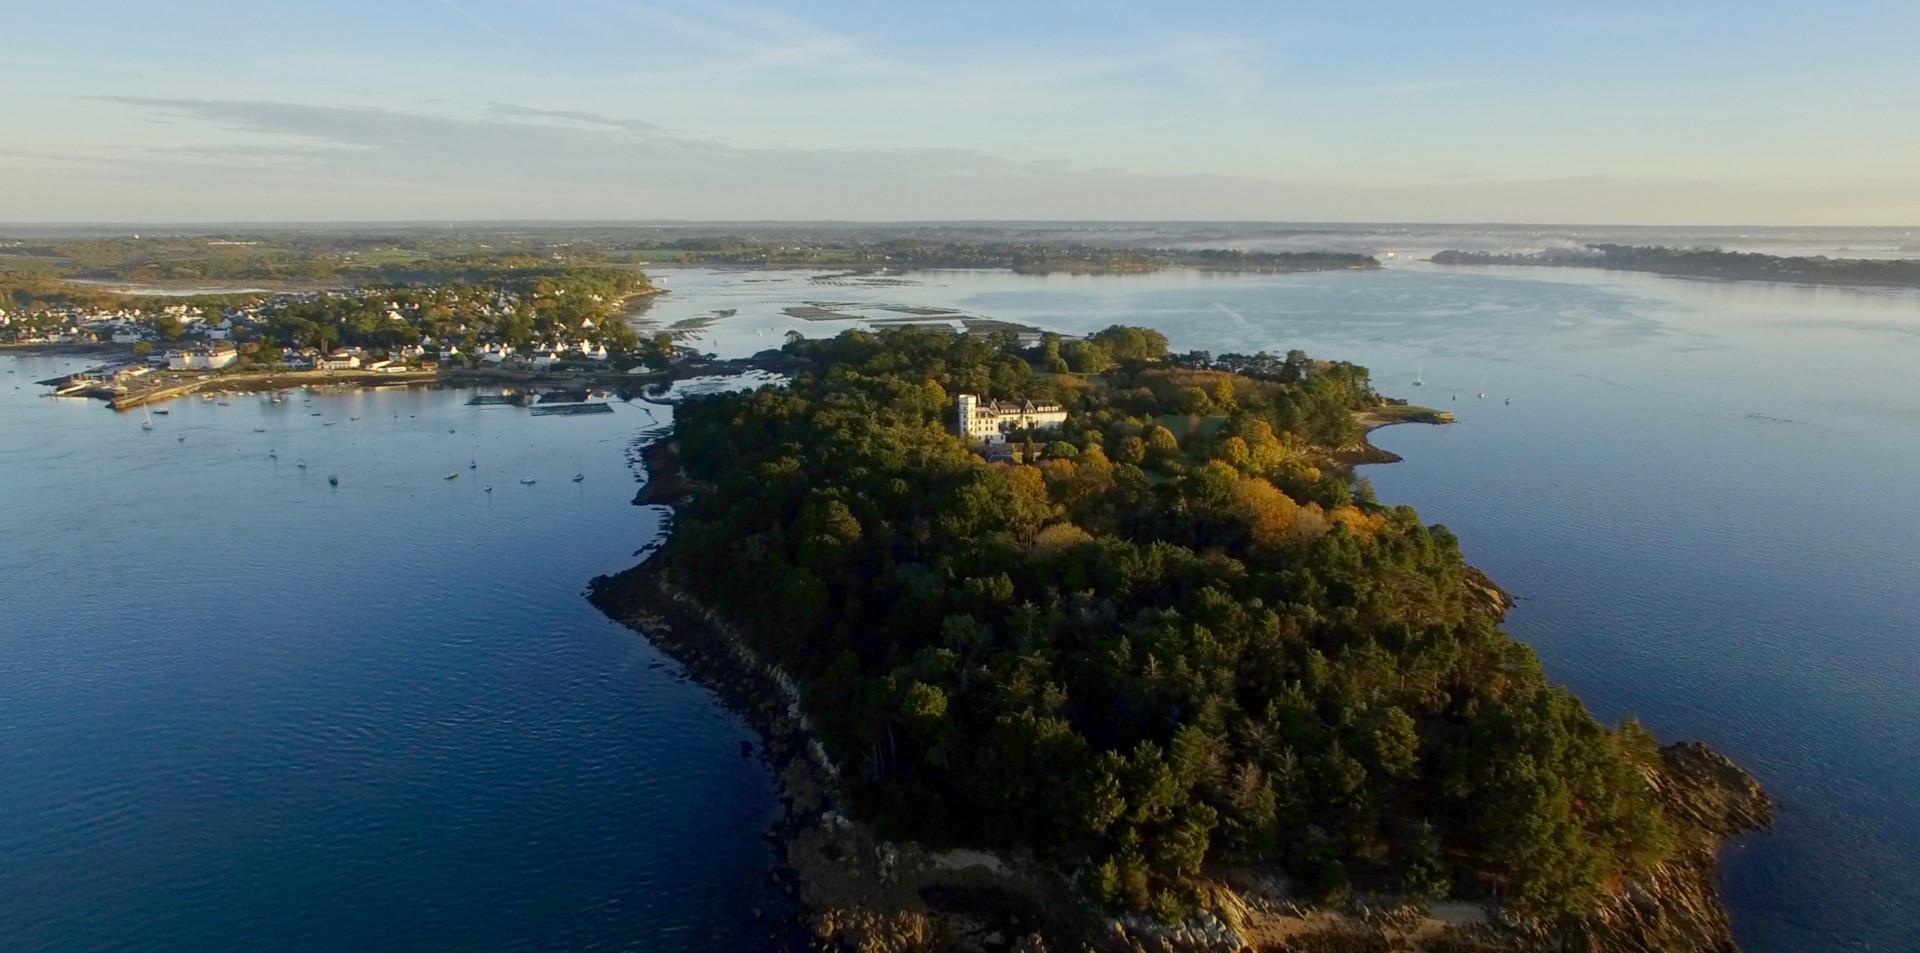 FlyUp Drone-Golf du Morbihan-Berder-21